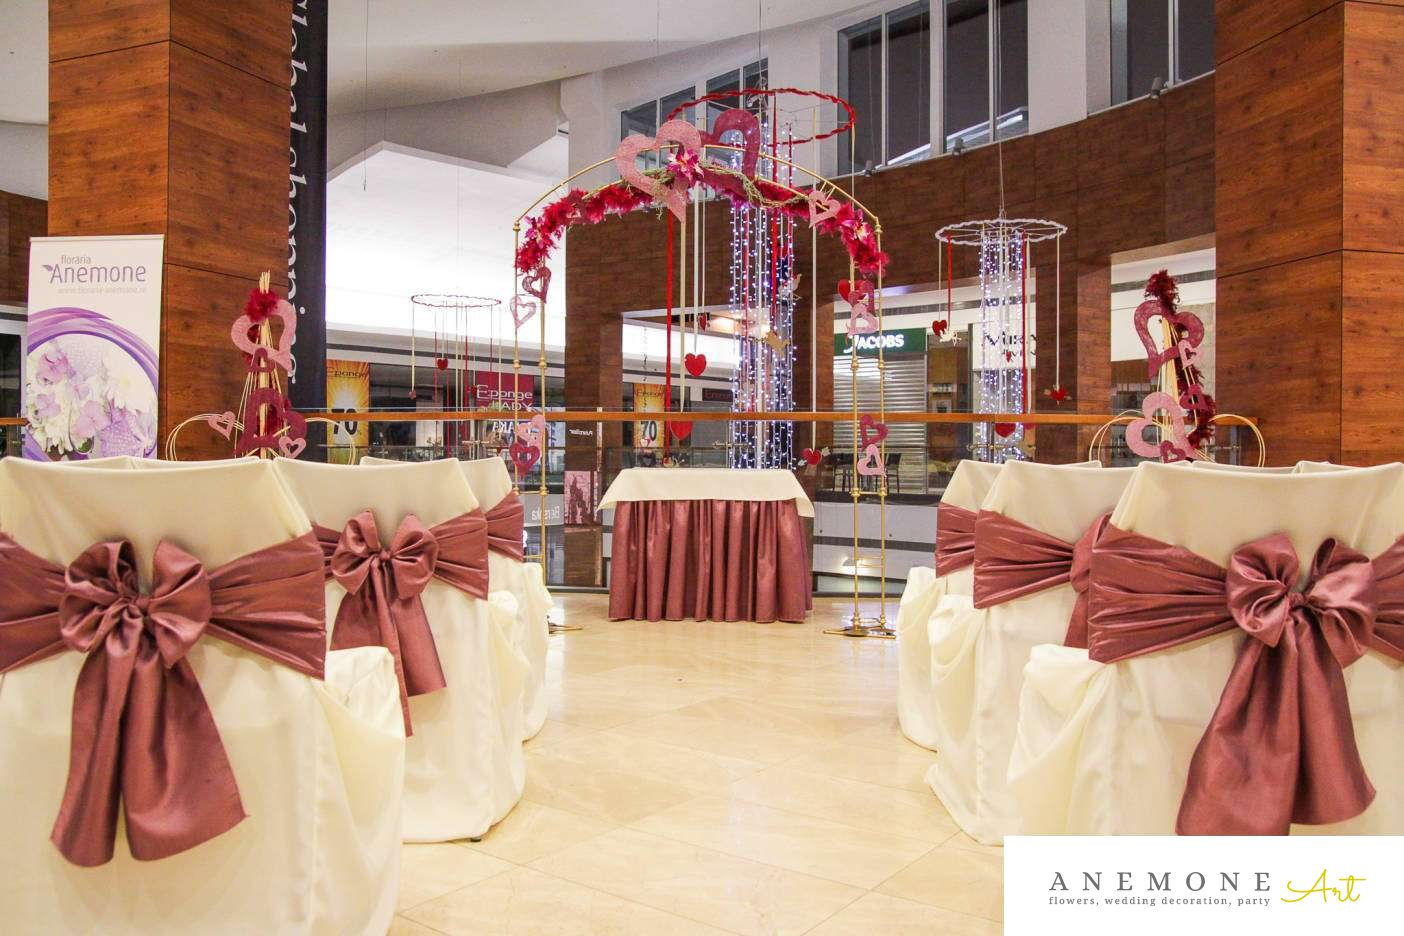 Poza, foto cu Flori de nunta anemone, decor sala, inima, rosu, roz in Arad, Timisoara, Oradea (wedding flowers, bouquets) nunta Arad, Timisoara, Oradea